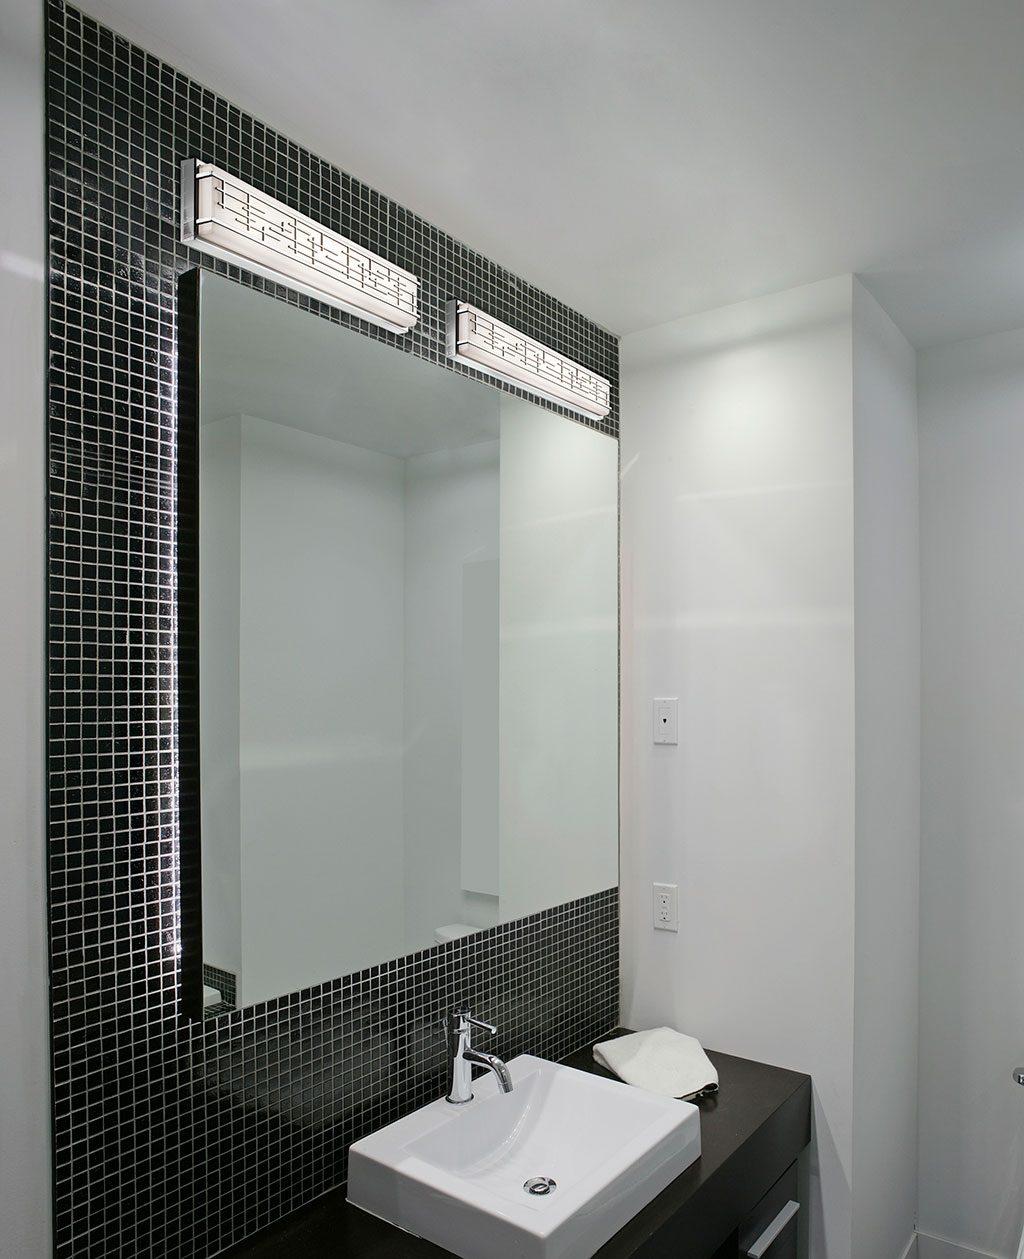 domestic-bathroom-design-bkg